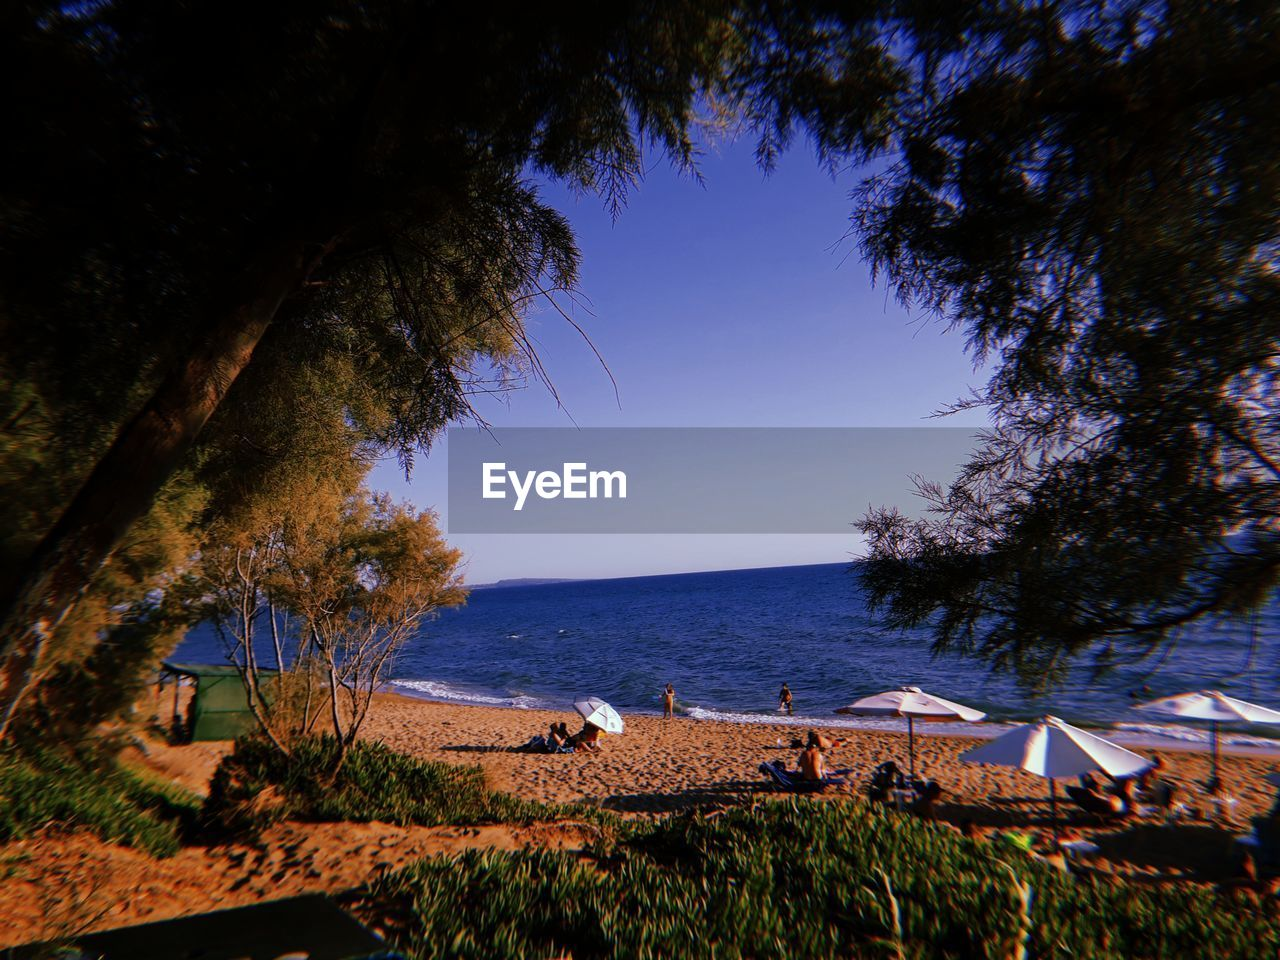 water, tree, plant, sky, sea, scenics - nature, beauty in nature, nature, tranquility, tranquil scene, land, horizon, horizon over water, beach, no people, clear sky, blue, growth, outdoors